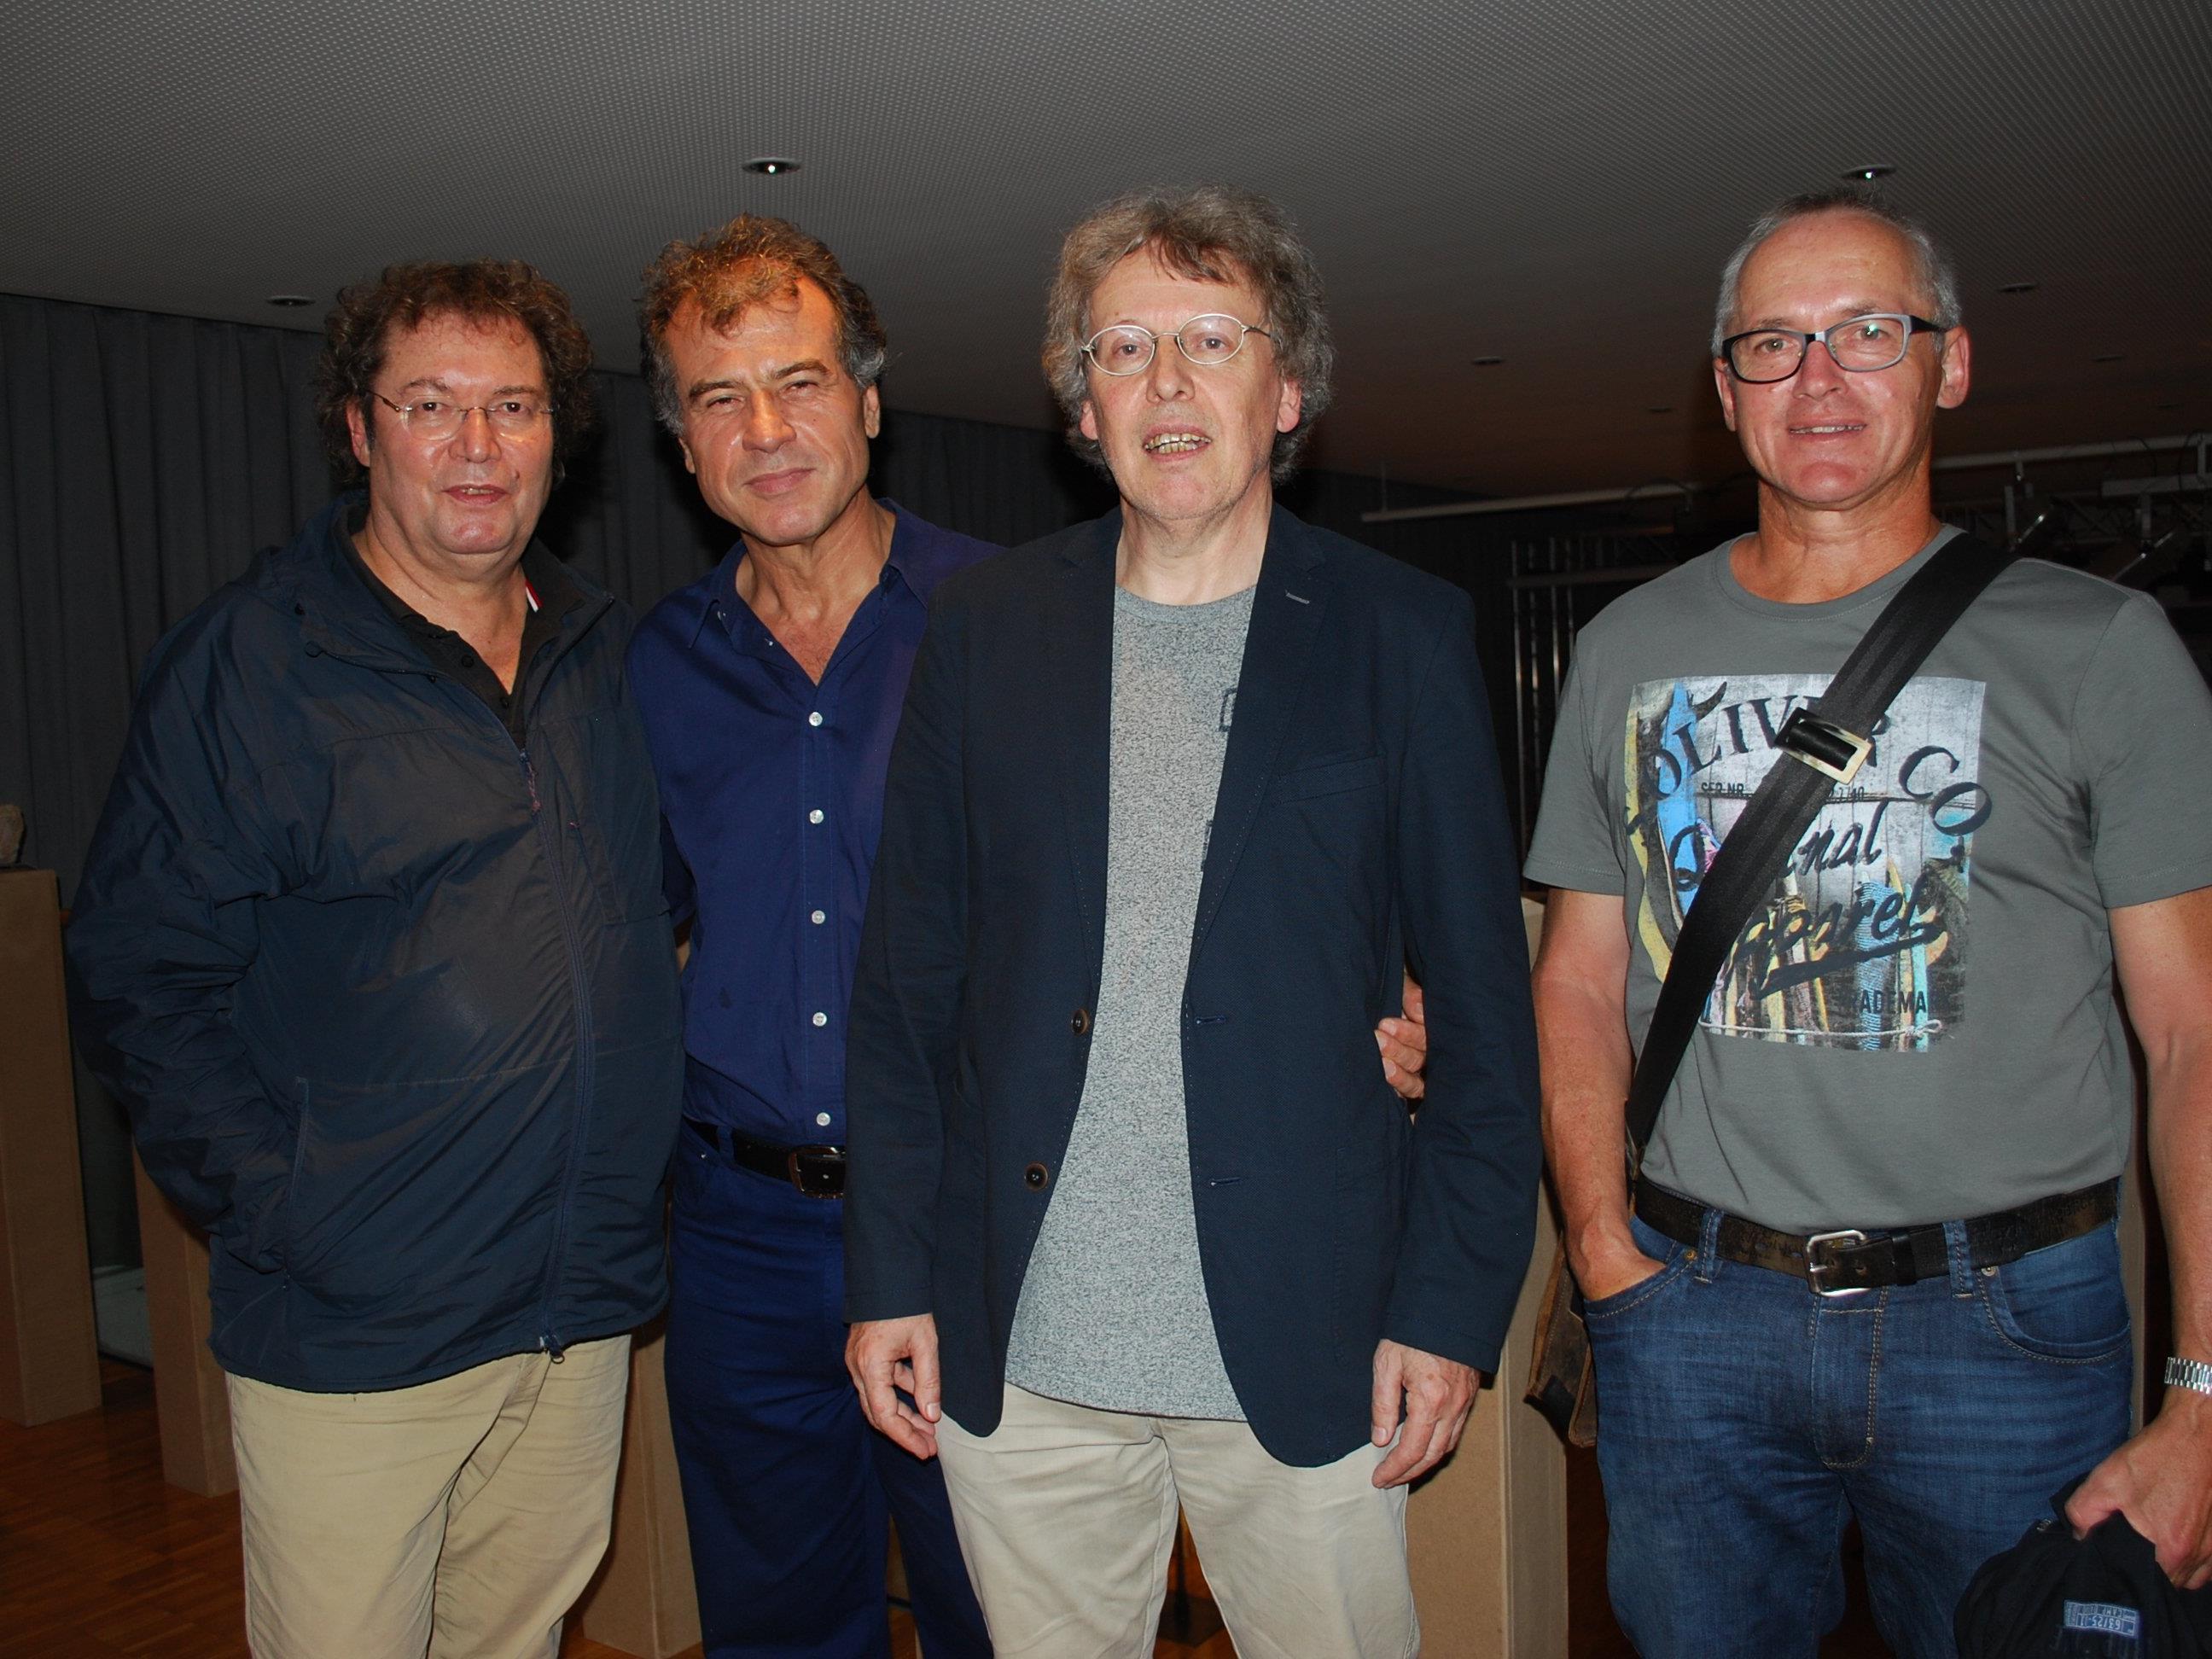 Peter Niedermair, Murat Üstün, Benny Gleeson, Georg Vith (vl)